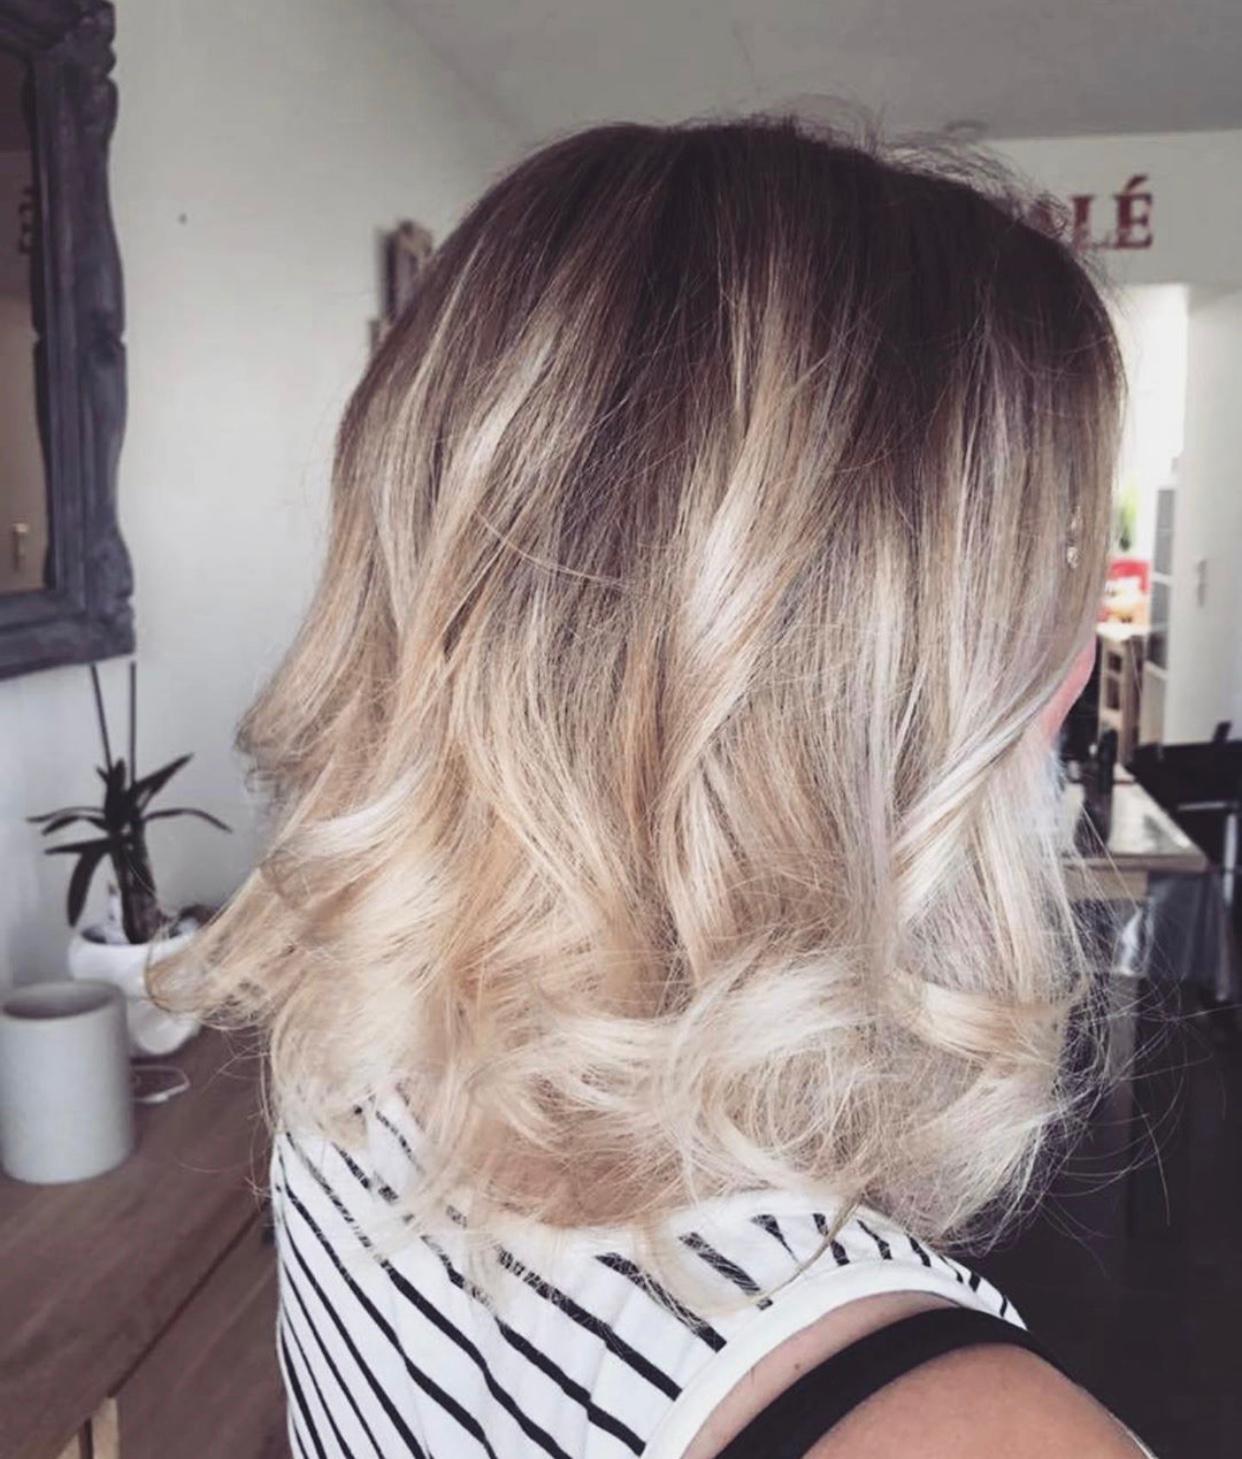 aml-nantes-emmanuelle-coiffure-lissage-04-30-1